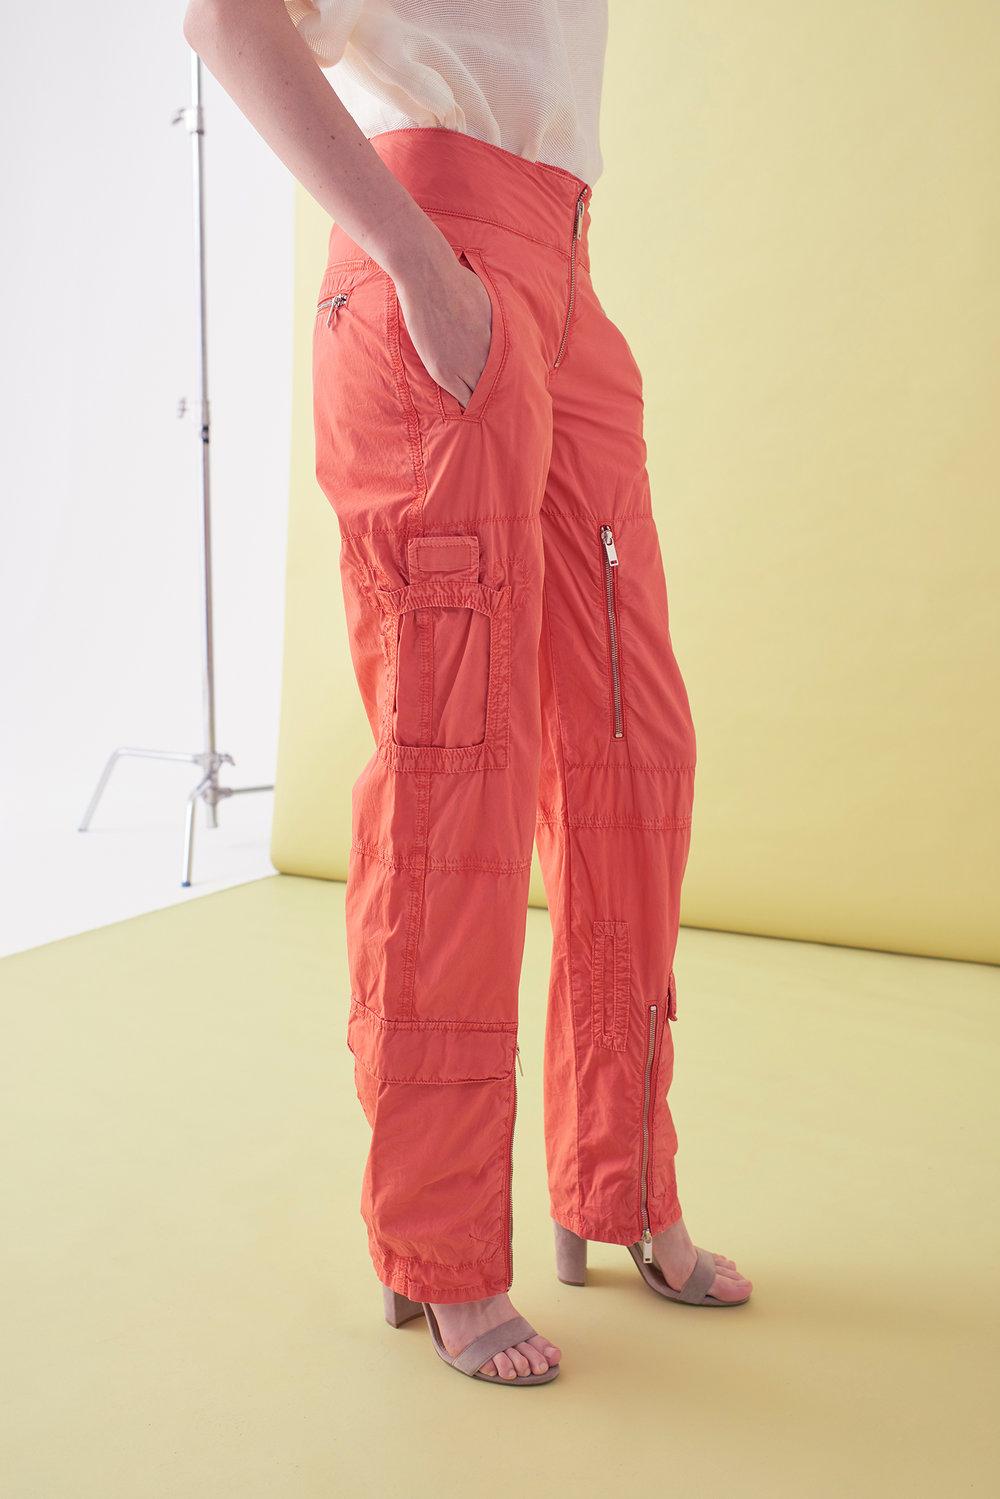 Sarah_Swann_SS17_14_Garment_Dyed_Rayon_Cotton_Utility_Trouser_Coral_S.jpg